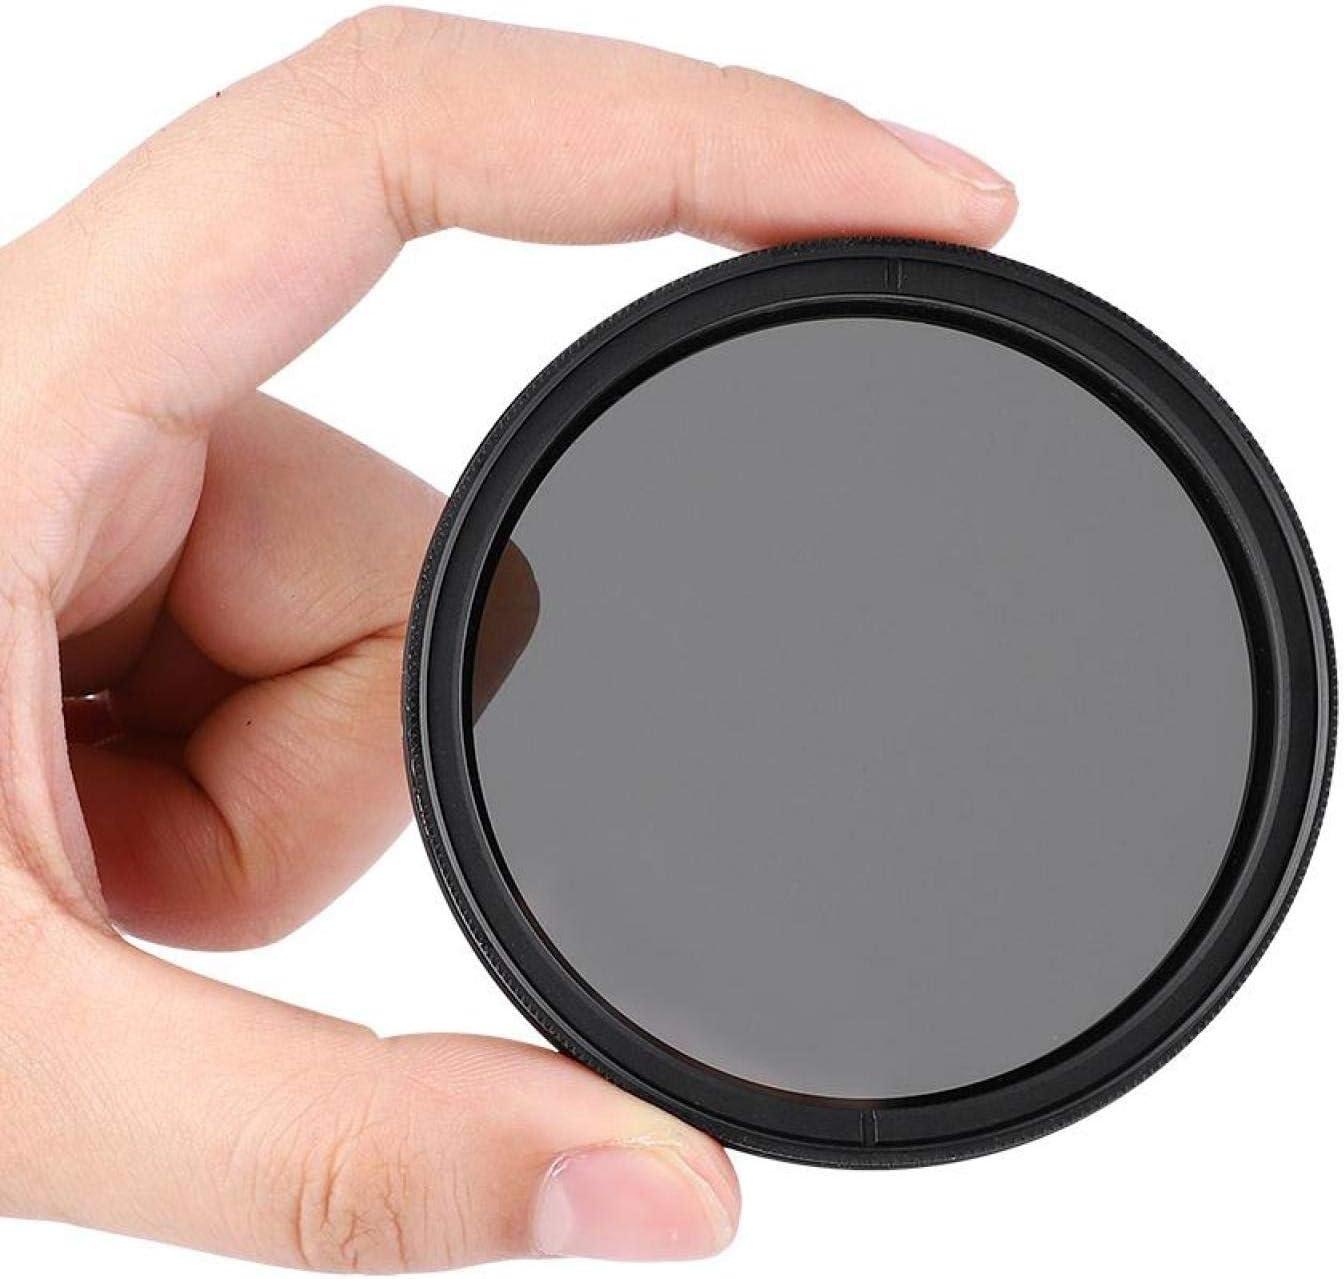 Portable 1cm Neutral Density Camera Came New mail Finally resale start order DSLR Filter ND2-400 for